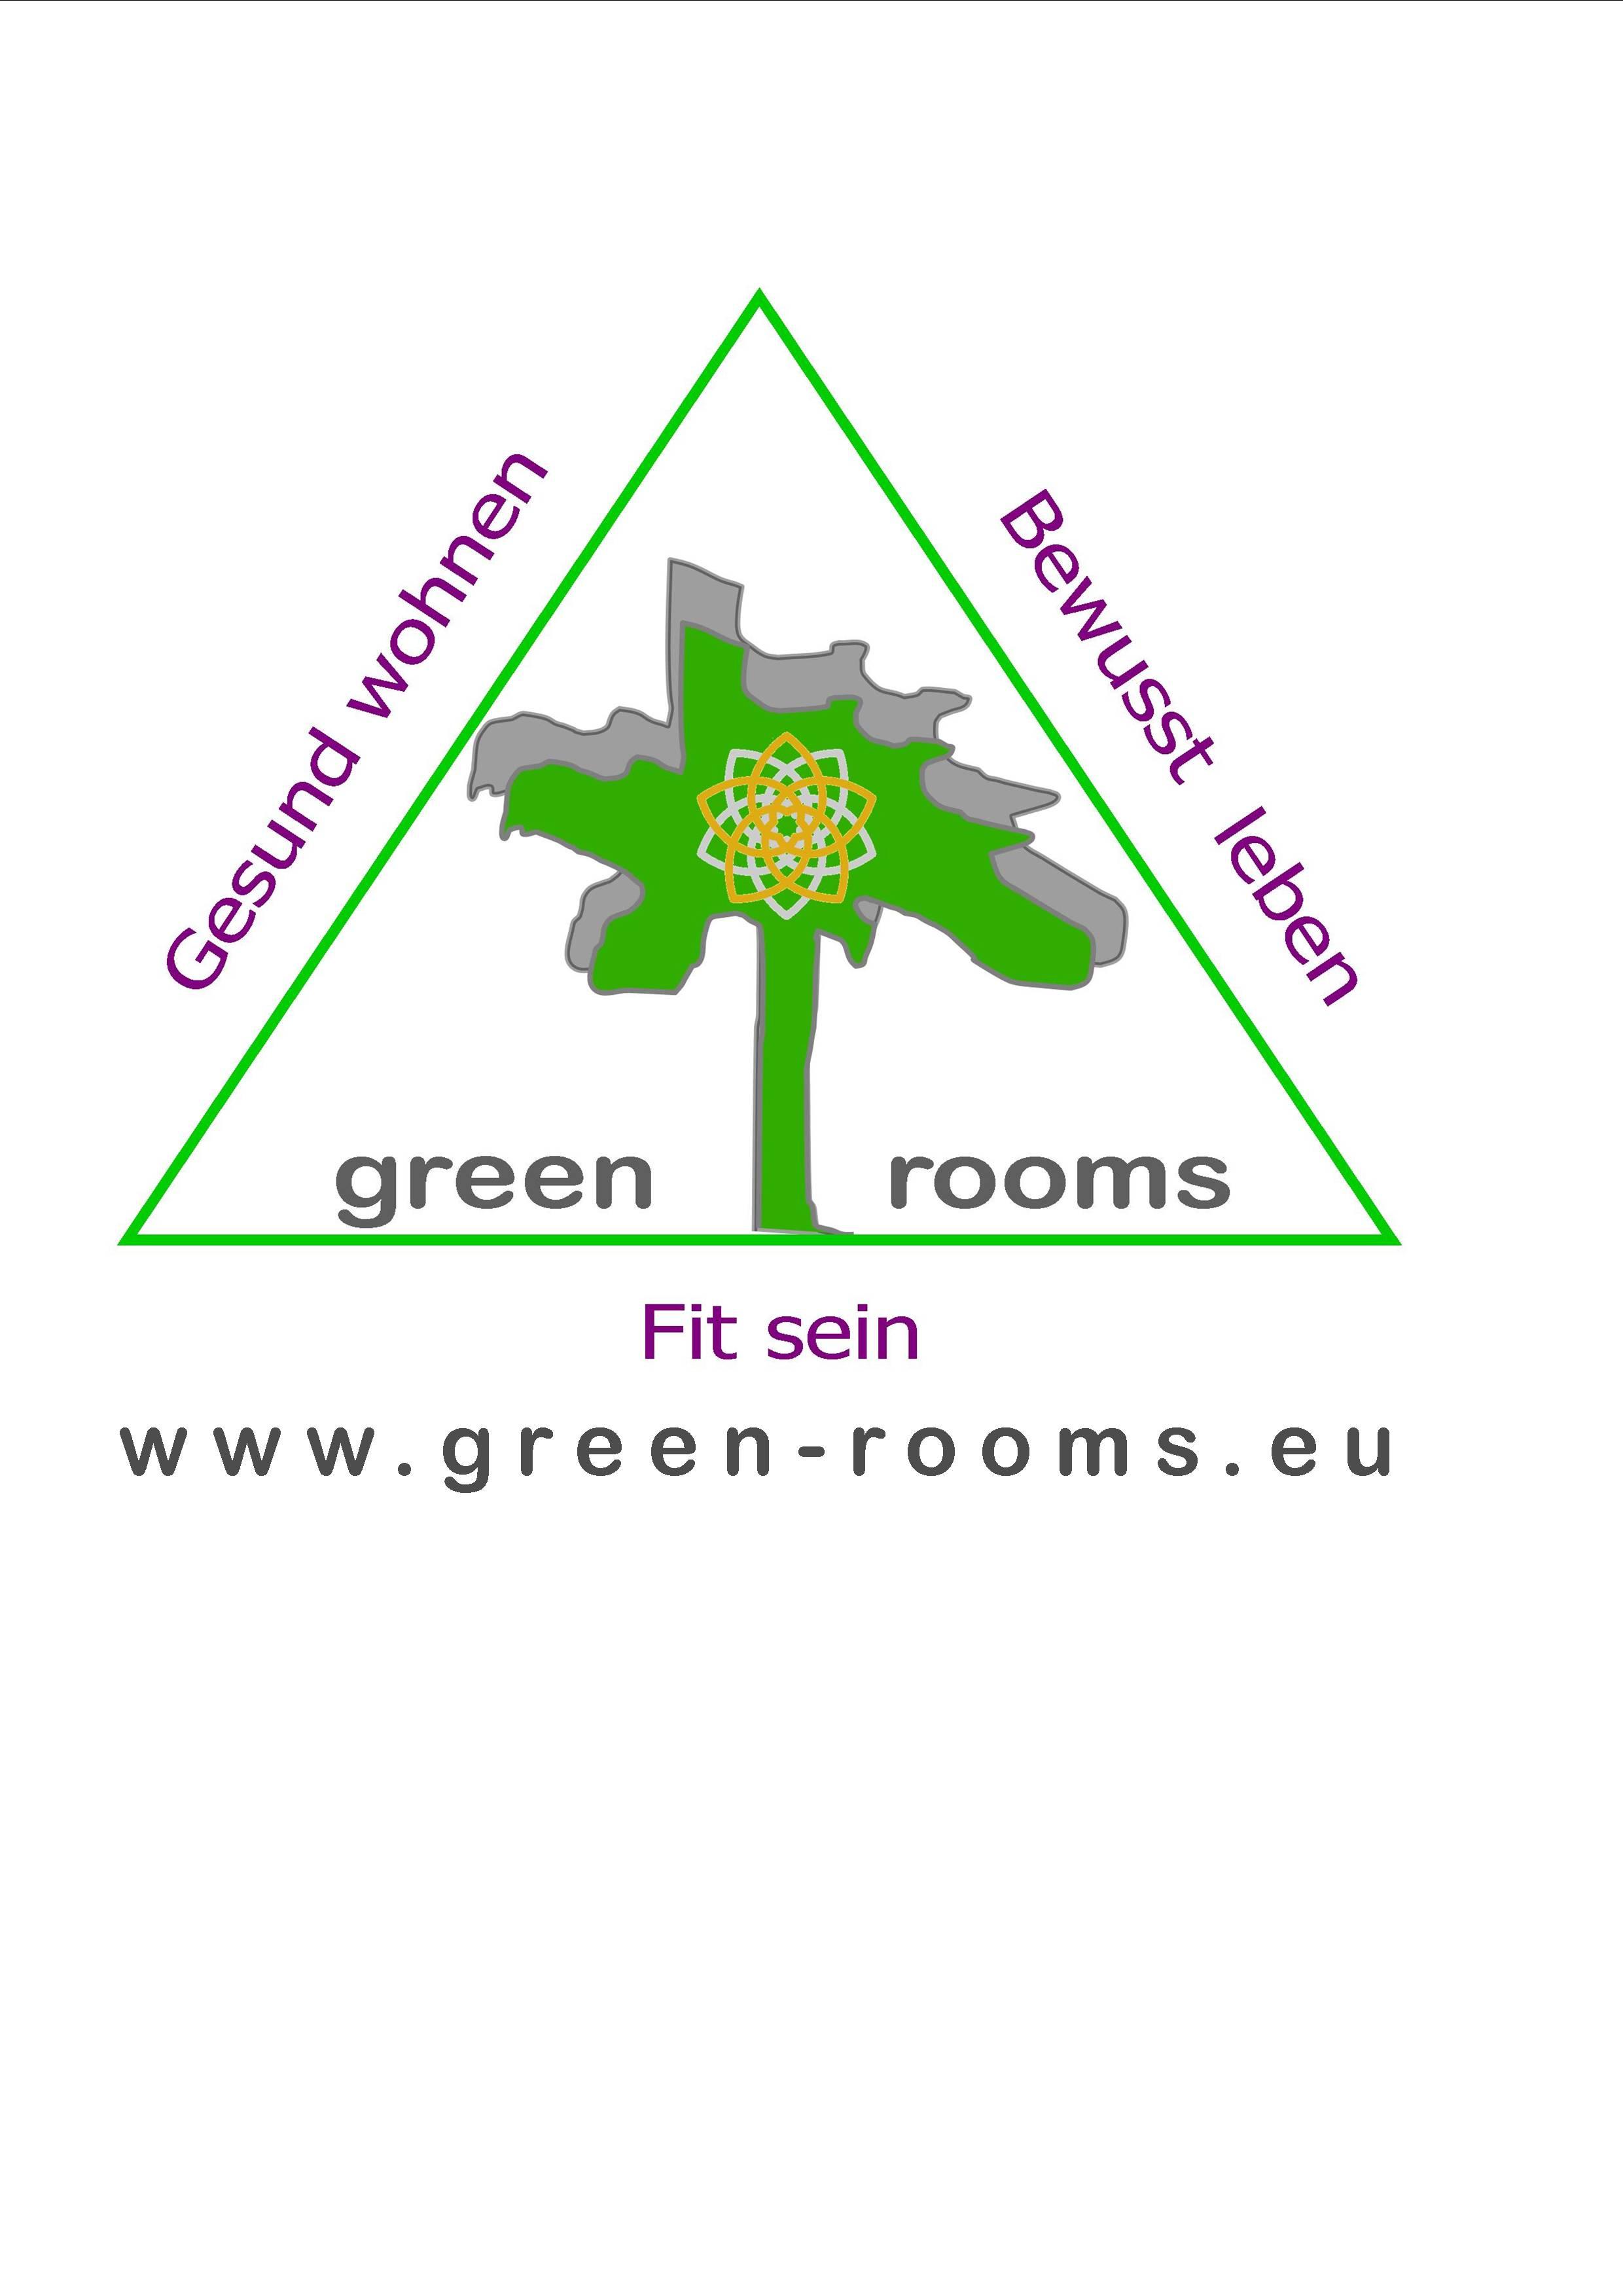 green-rooms - Habl raumdesign